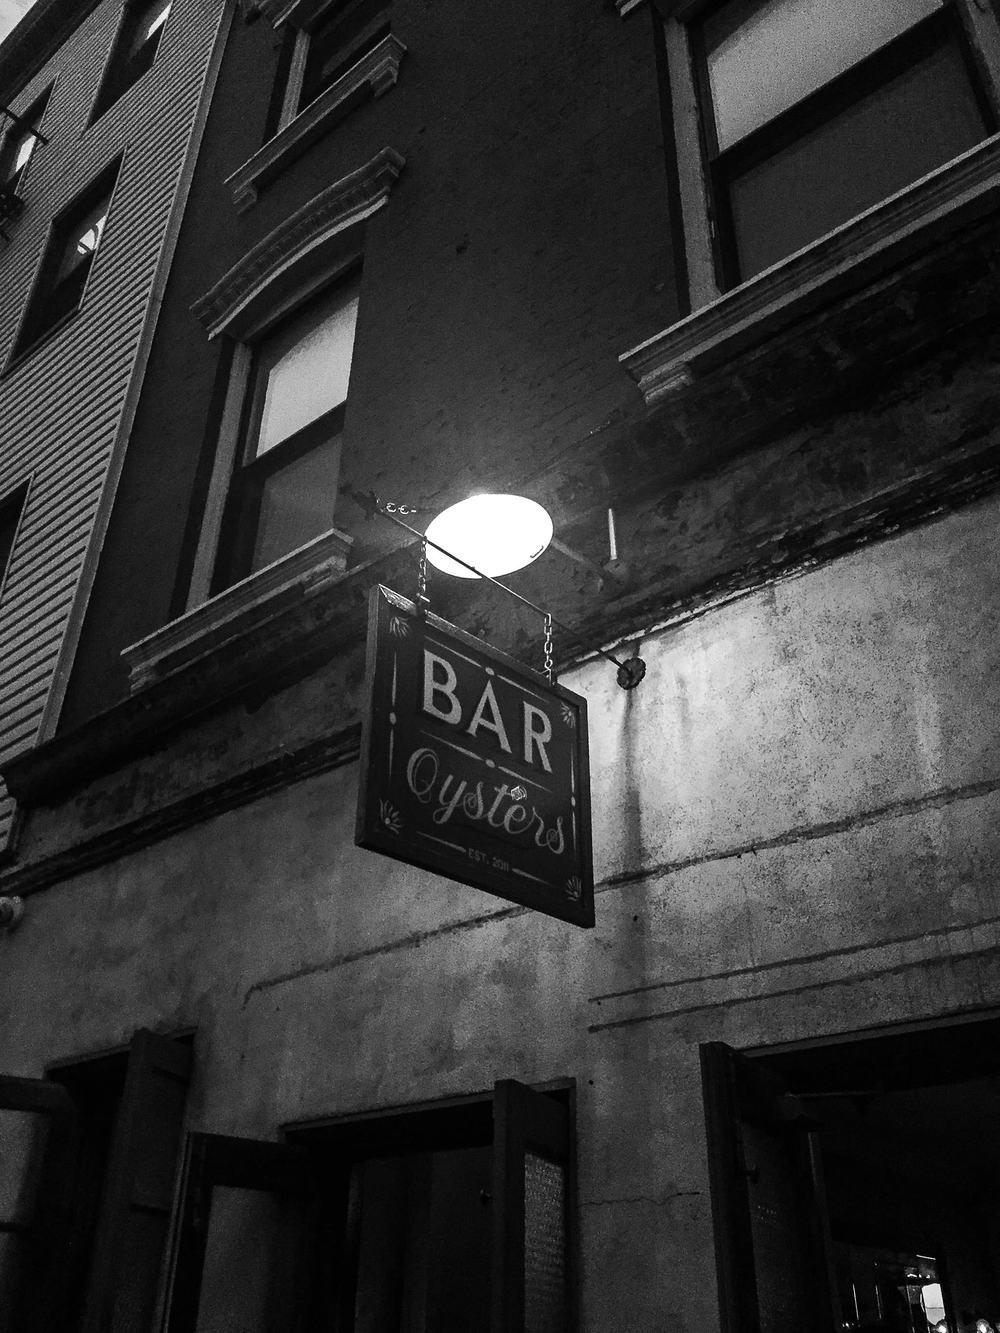 Williamsburg, Brooklyn, NY (Sep 2015)